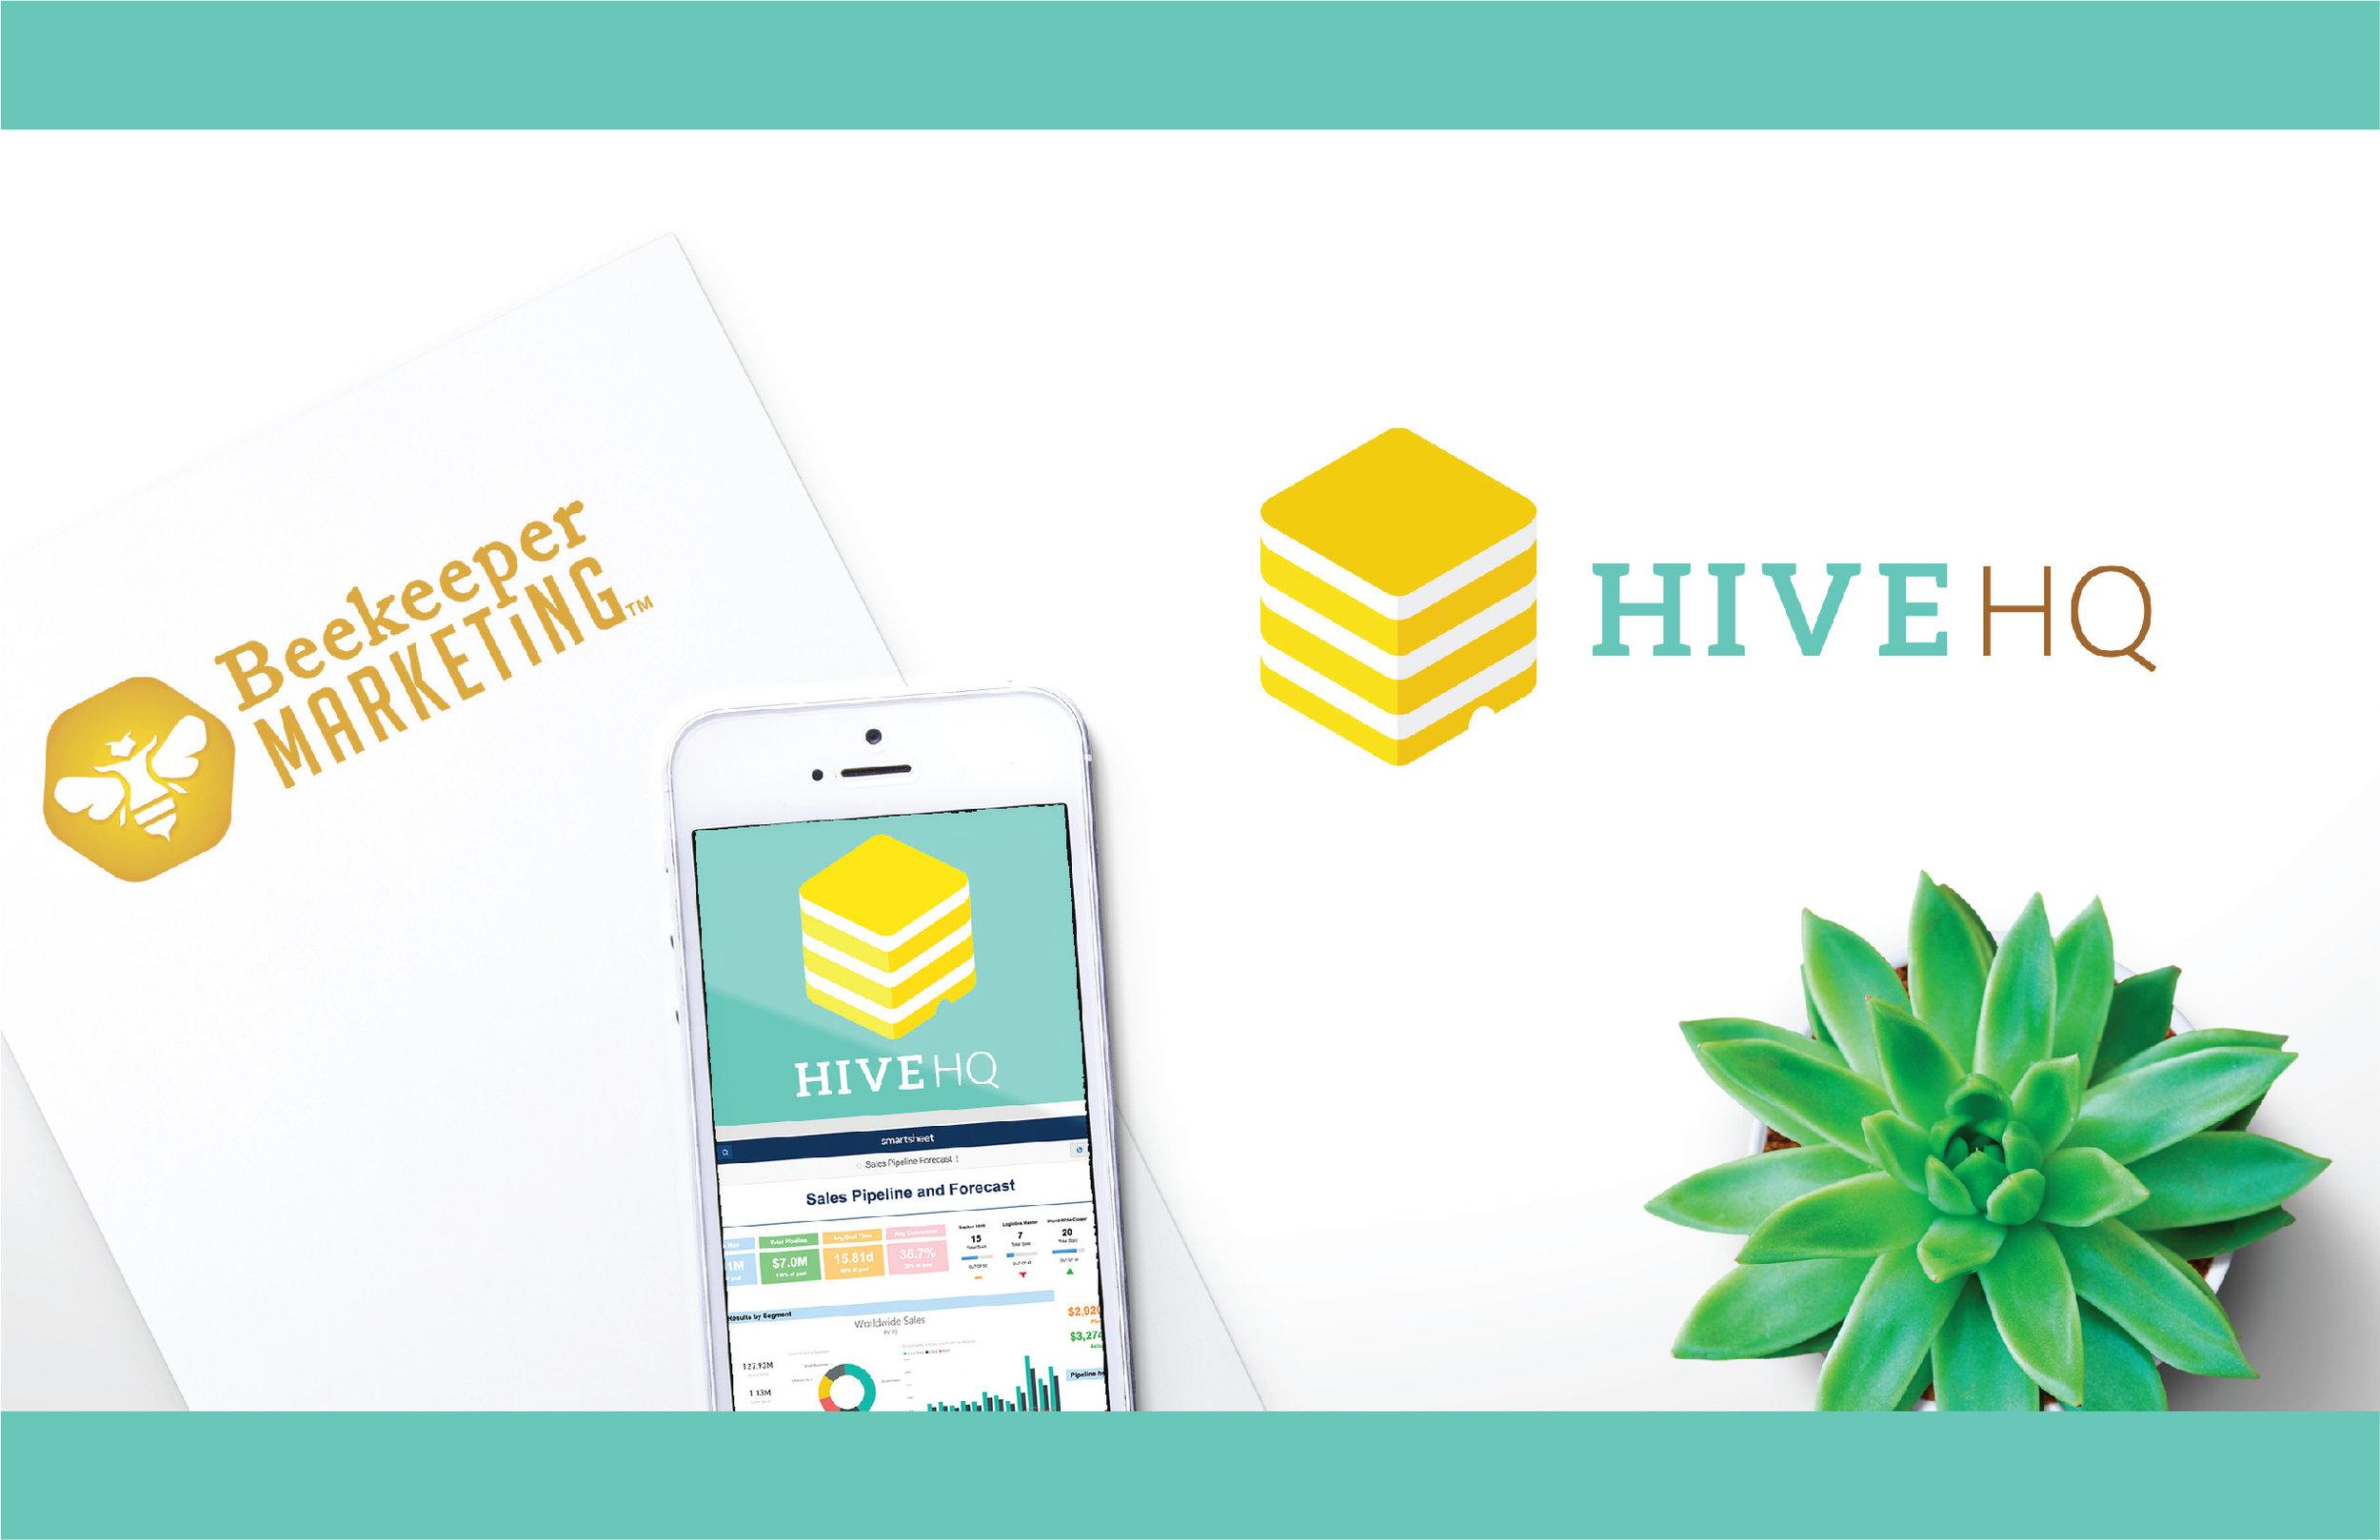 HoneyHiveHQ_LogoConcepts_Hive - 3.jpg